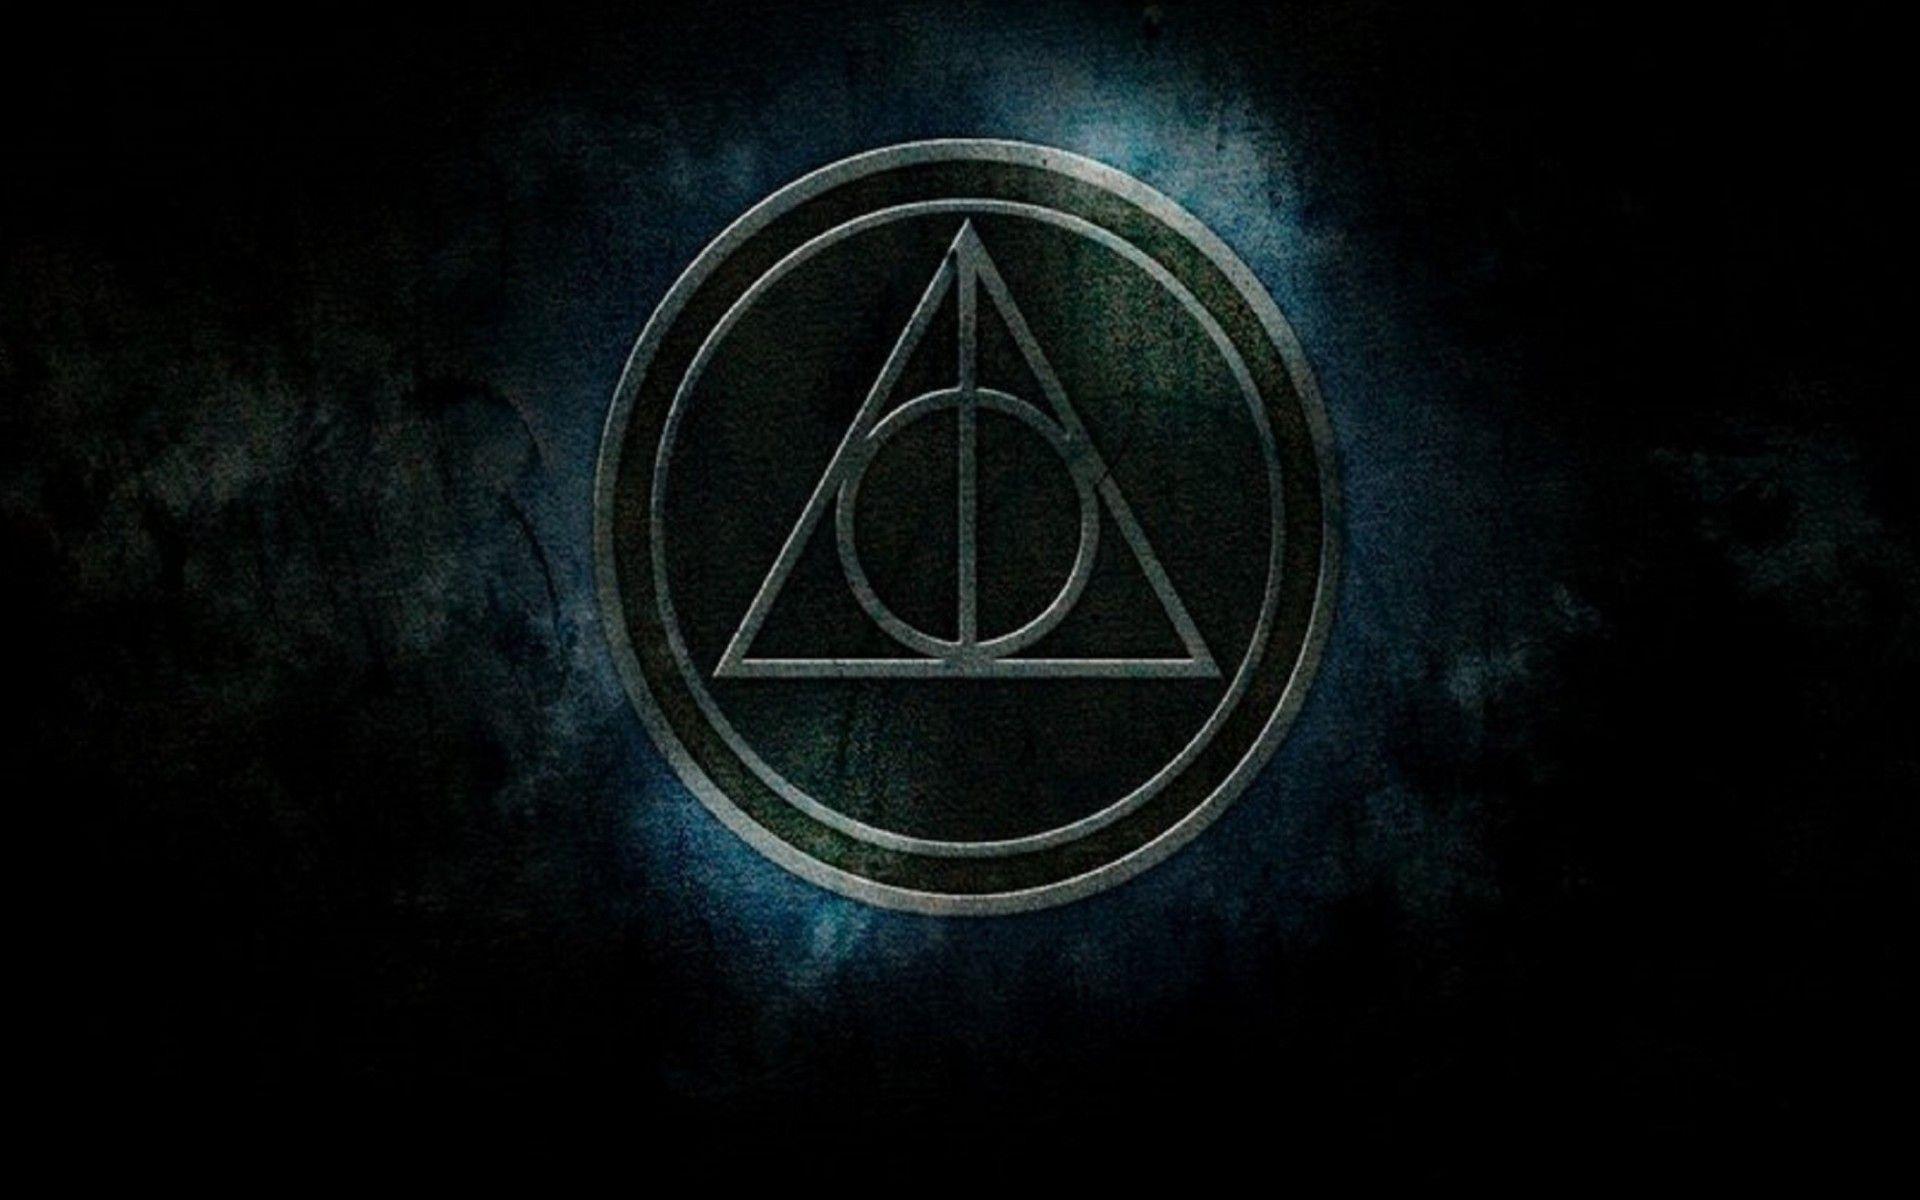 Harry Potter Ipad Wallpapers Top Free Harry Potter Ipad